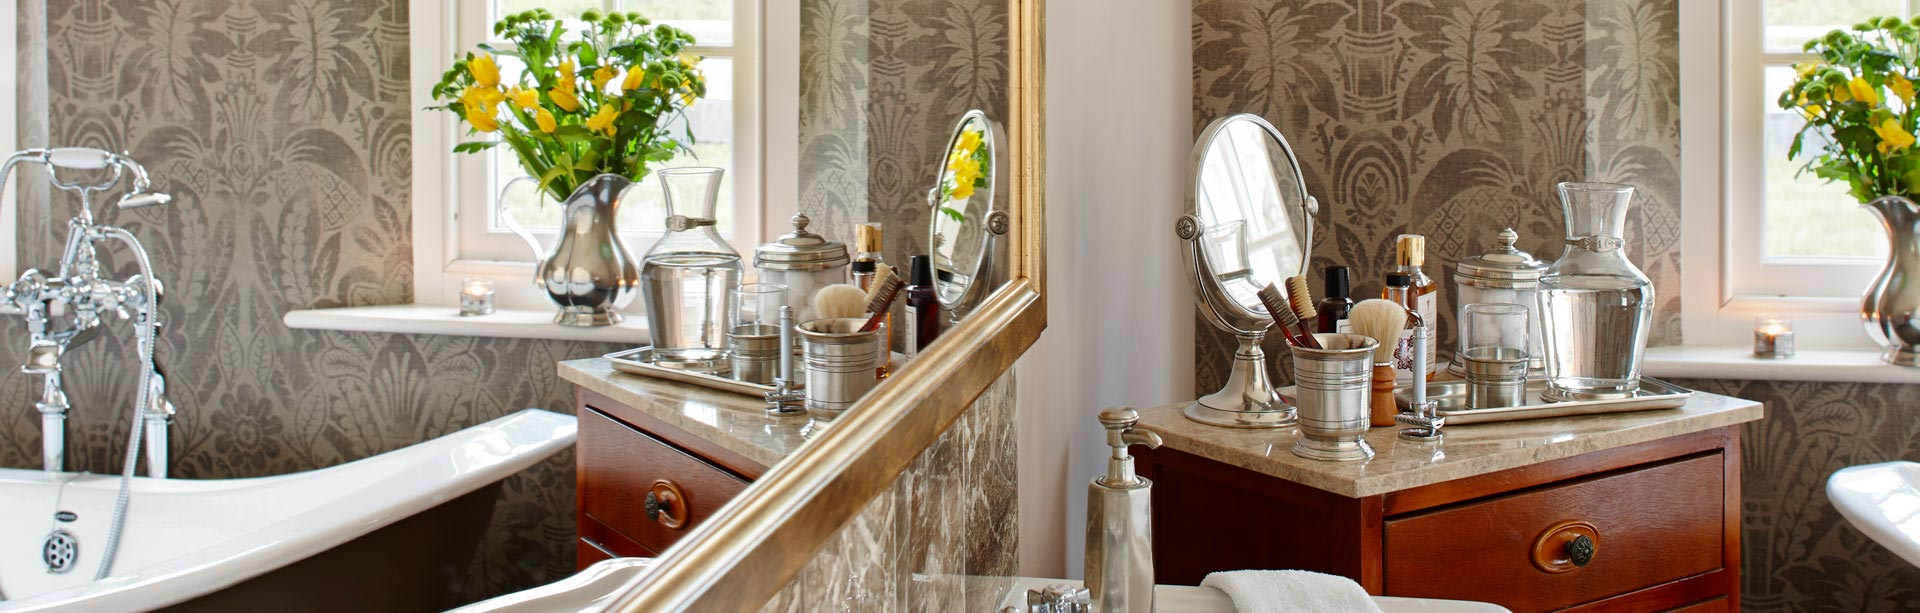 Bath accessories Сделано в Италии